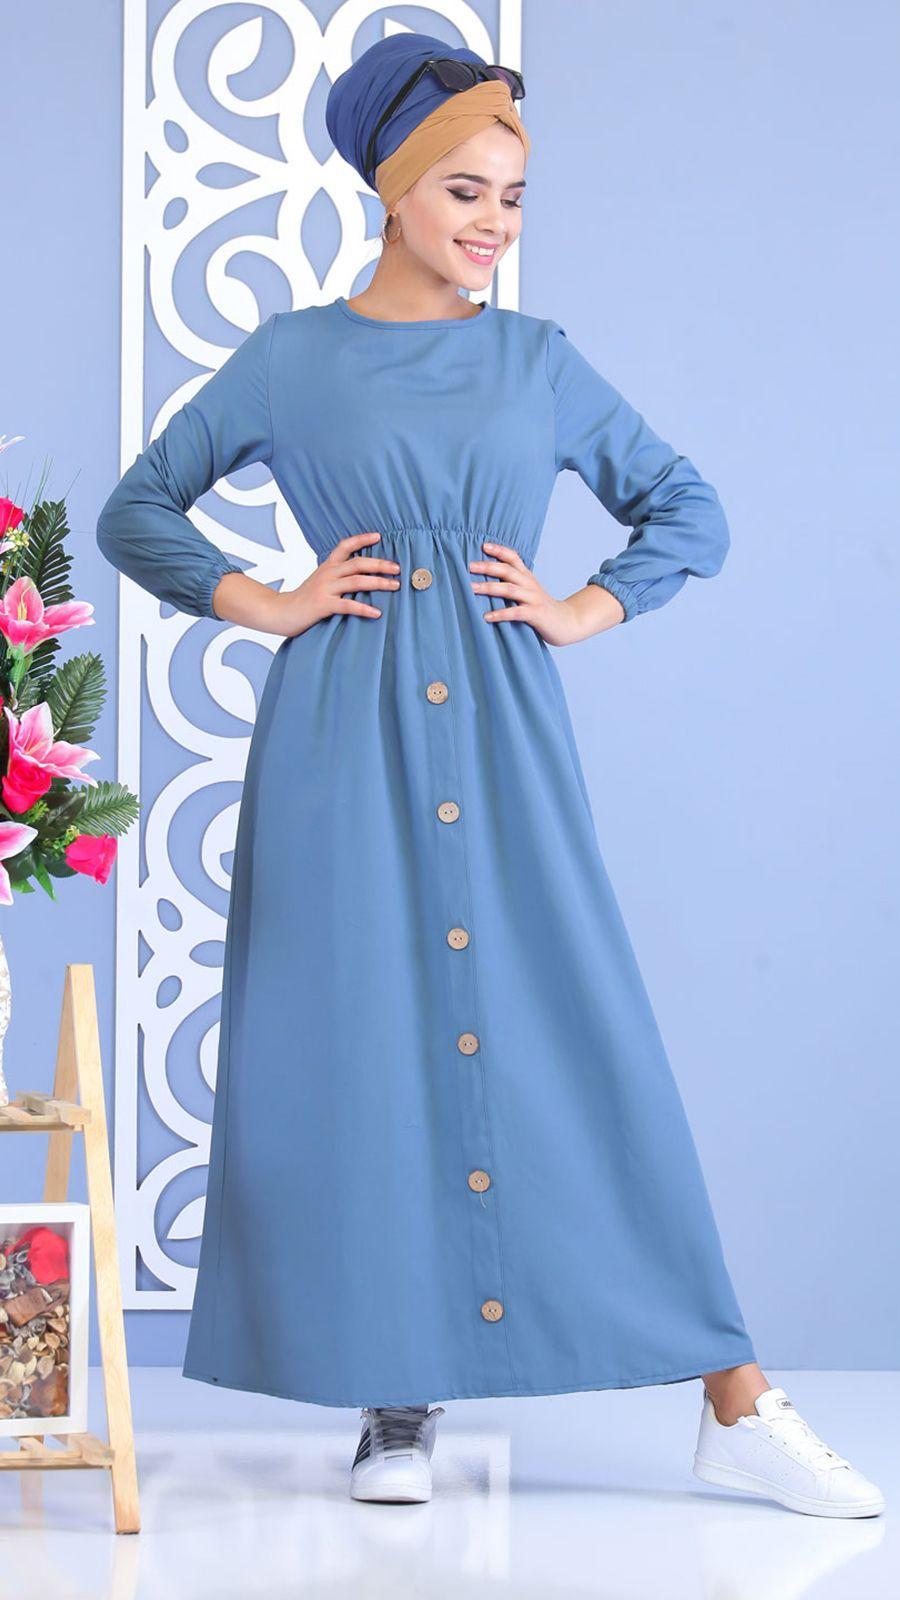 Tesettur Elbise Tesettur Elbise Kombin Tesettur Abiye Tofisa Com Elbise The Dress Elbise Modelleri